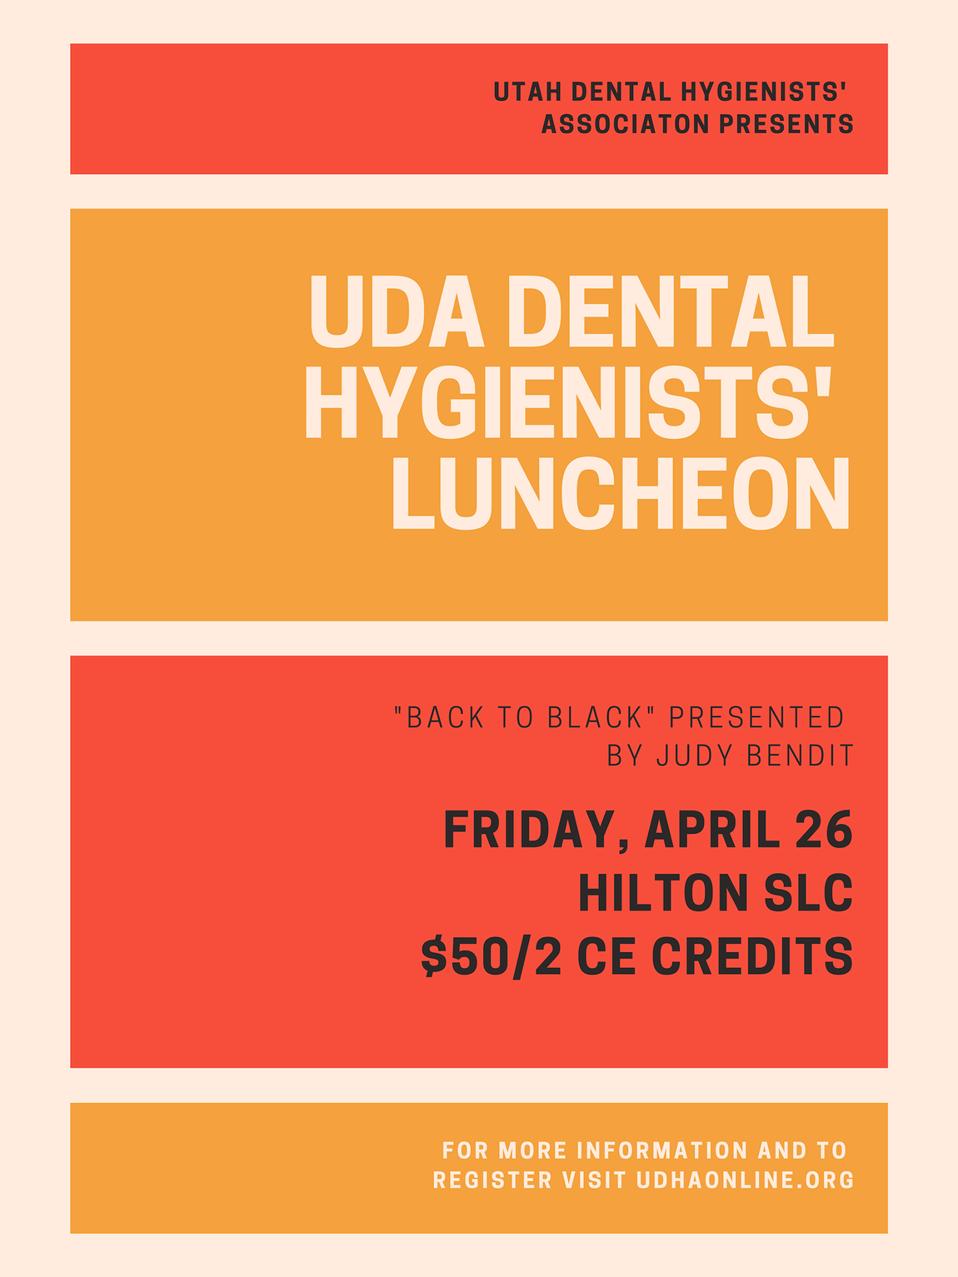 UDHA Luncheon @ UDA Convention